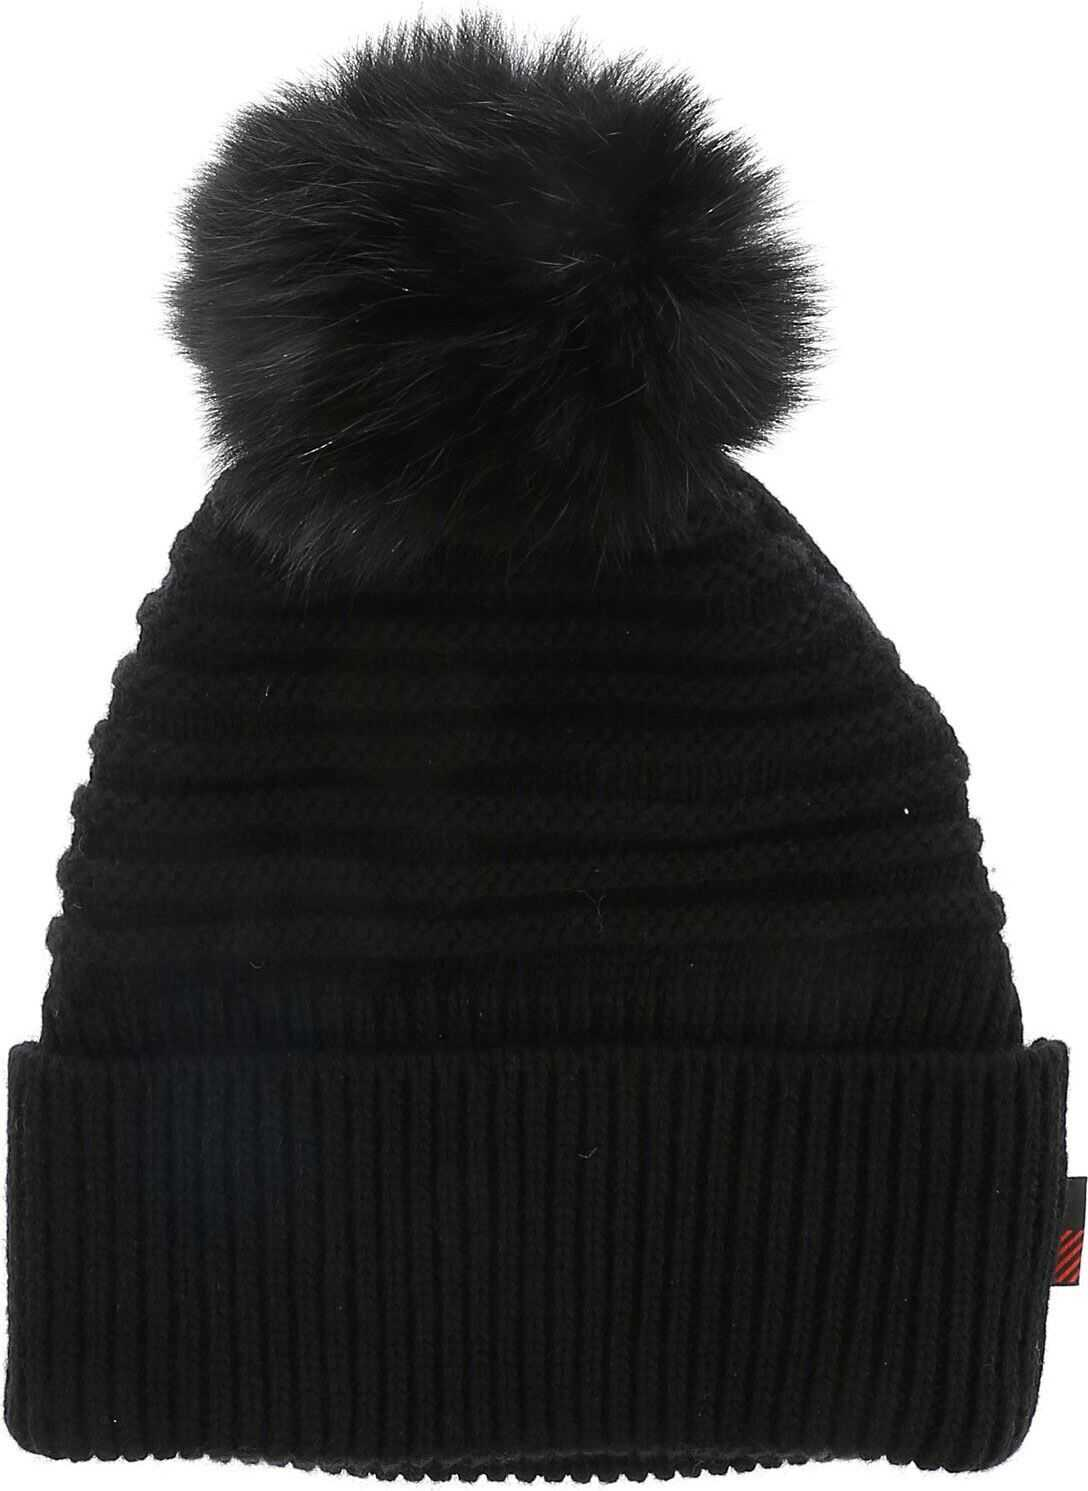 Black Beanie With Fur Pom Pon thumbnail